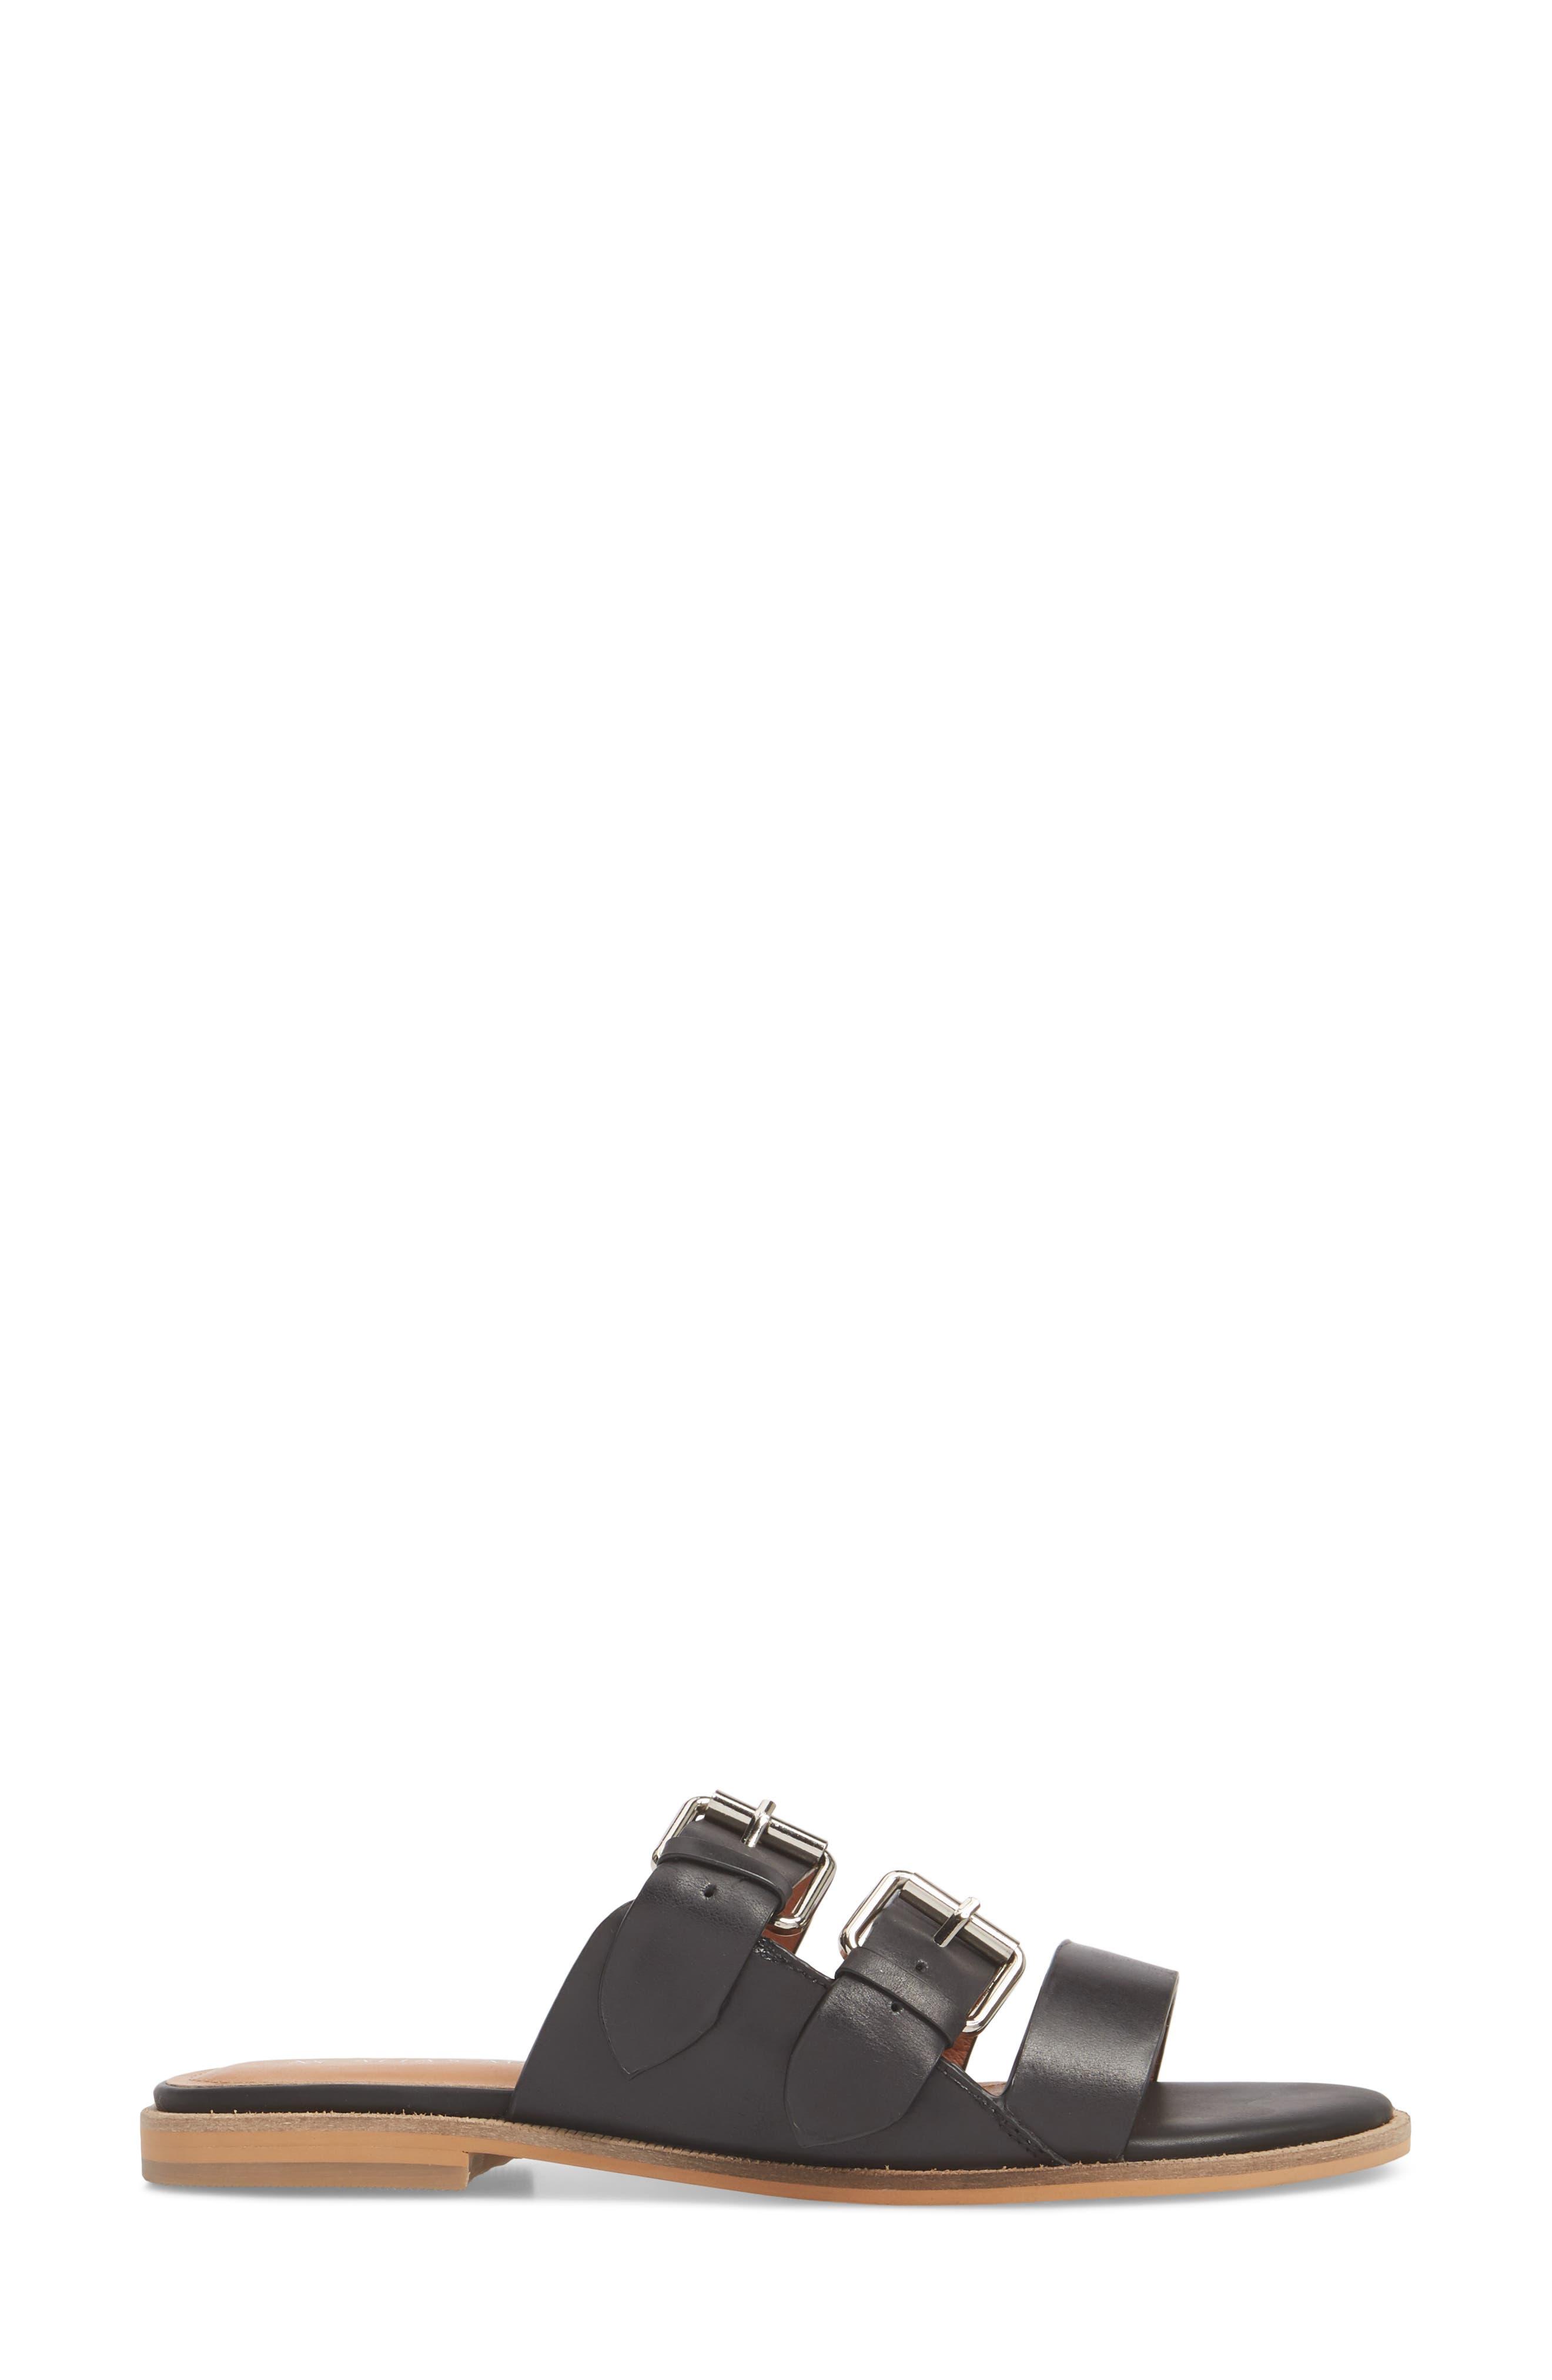 Theatre Buckled Slide Sandal,                             Alternate thumbnail 3, color,                             Black Leather